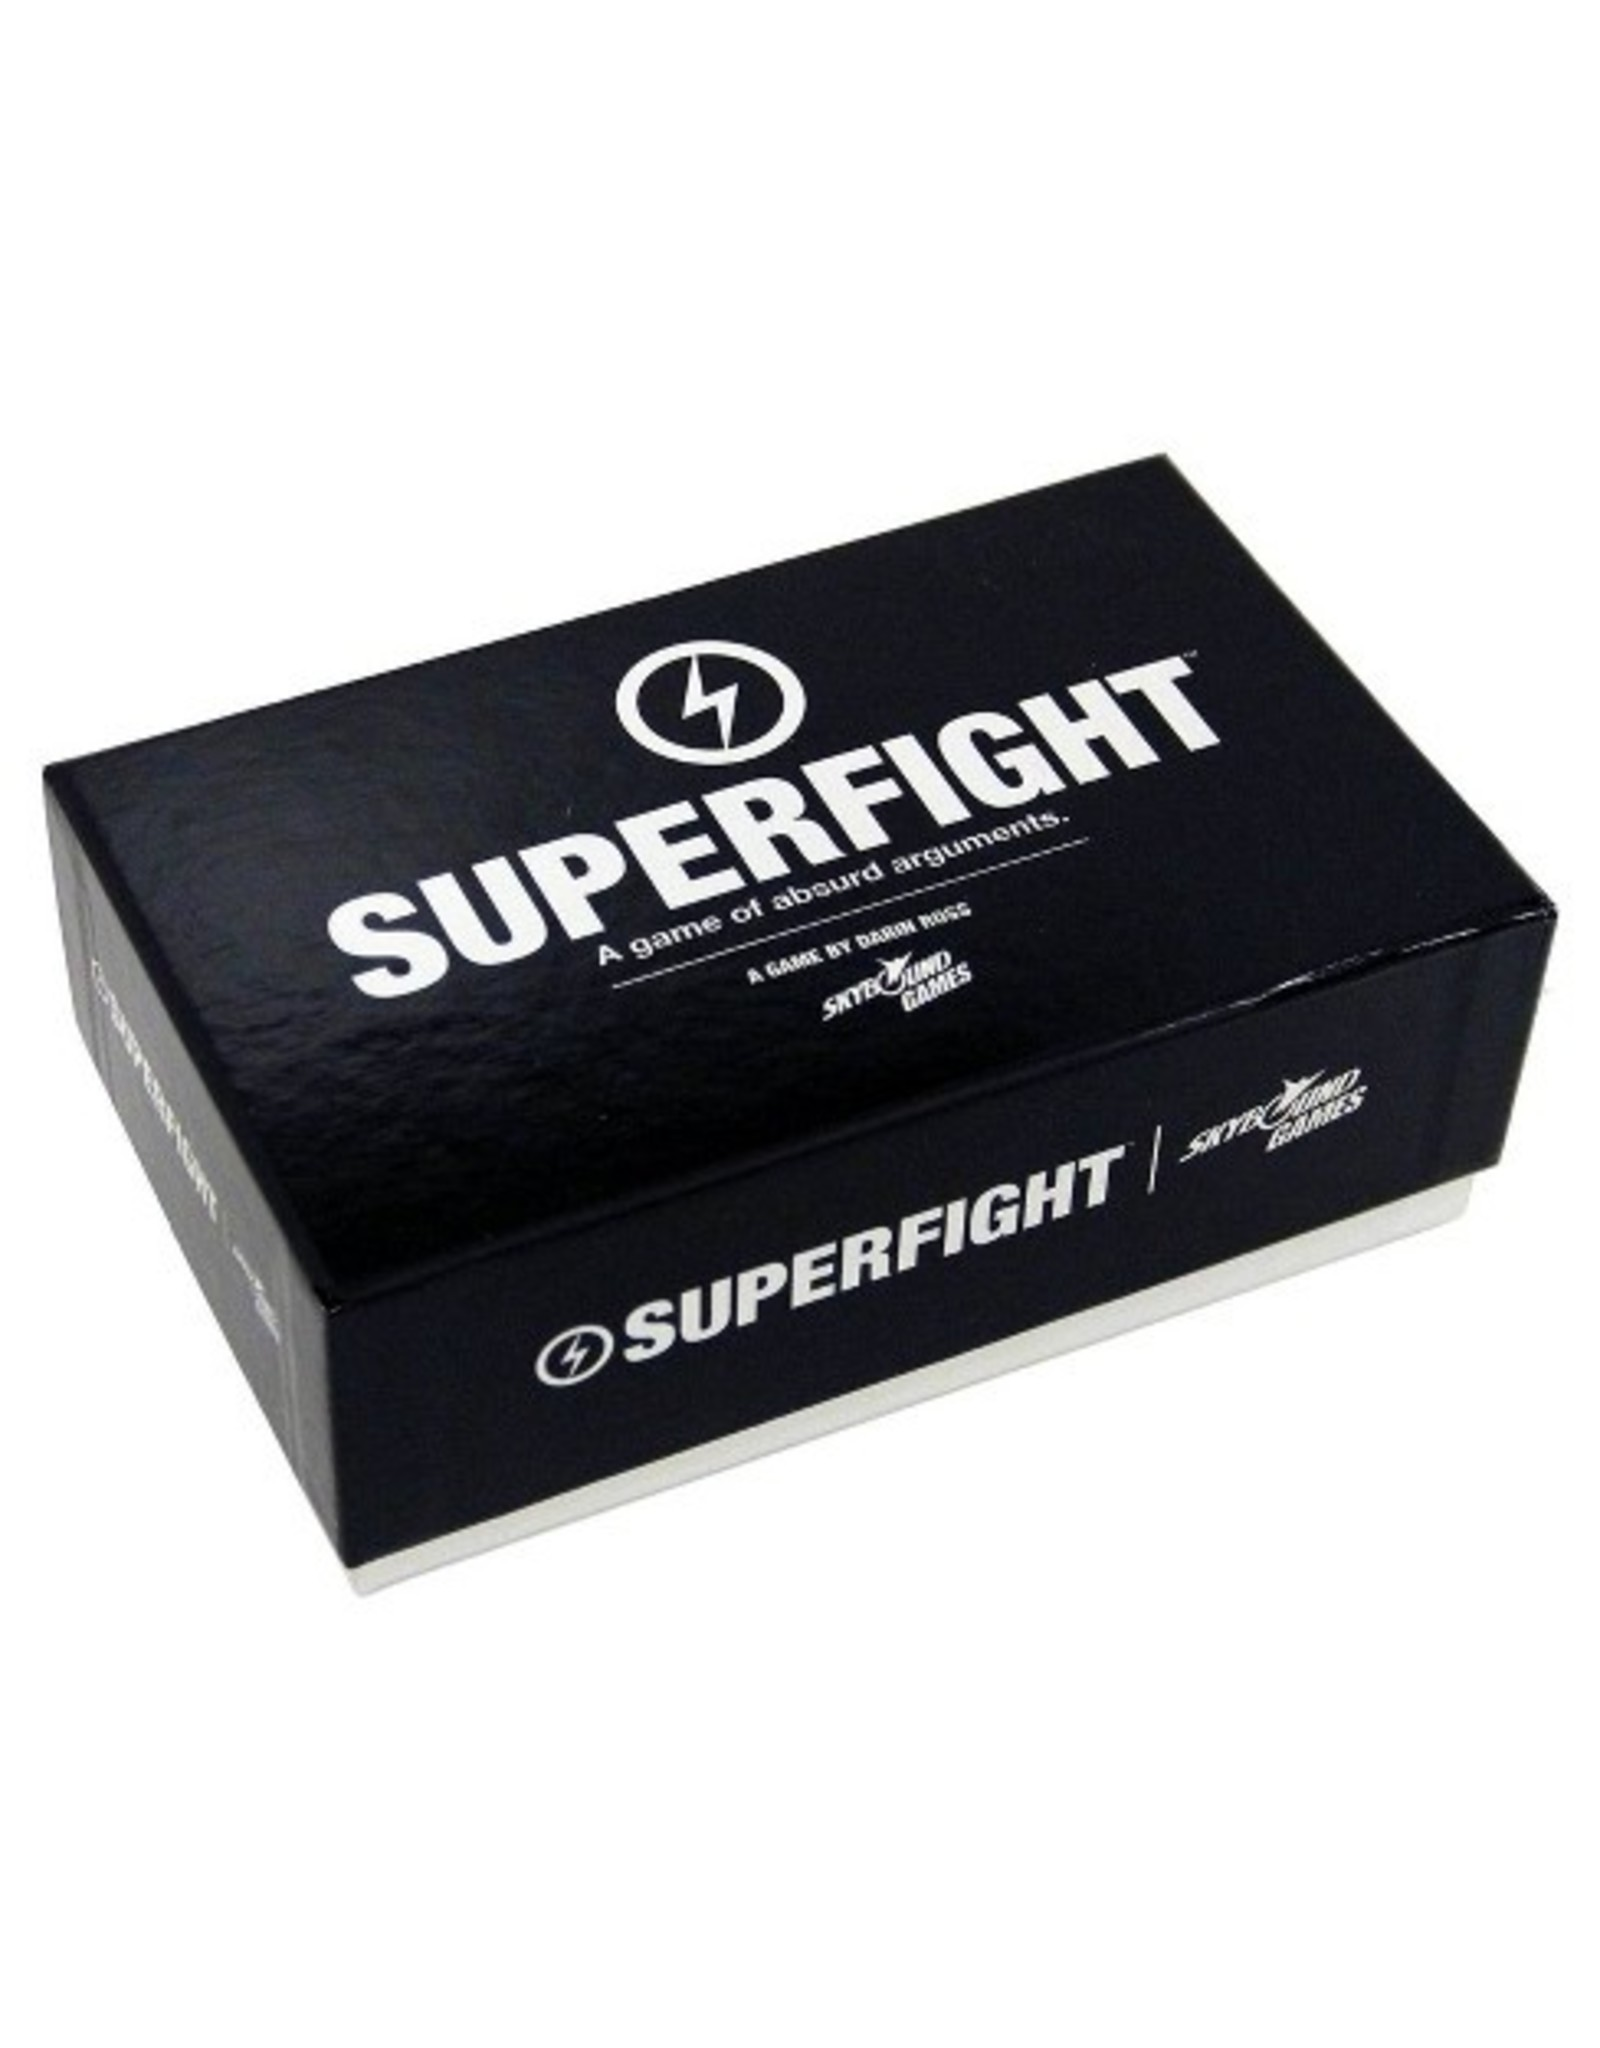 SUPERFIGHT 500-Card Core Deck